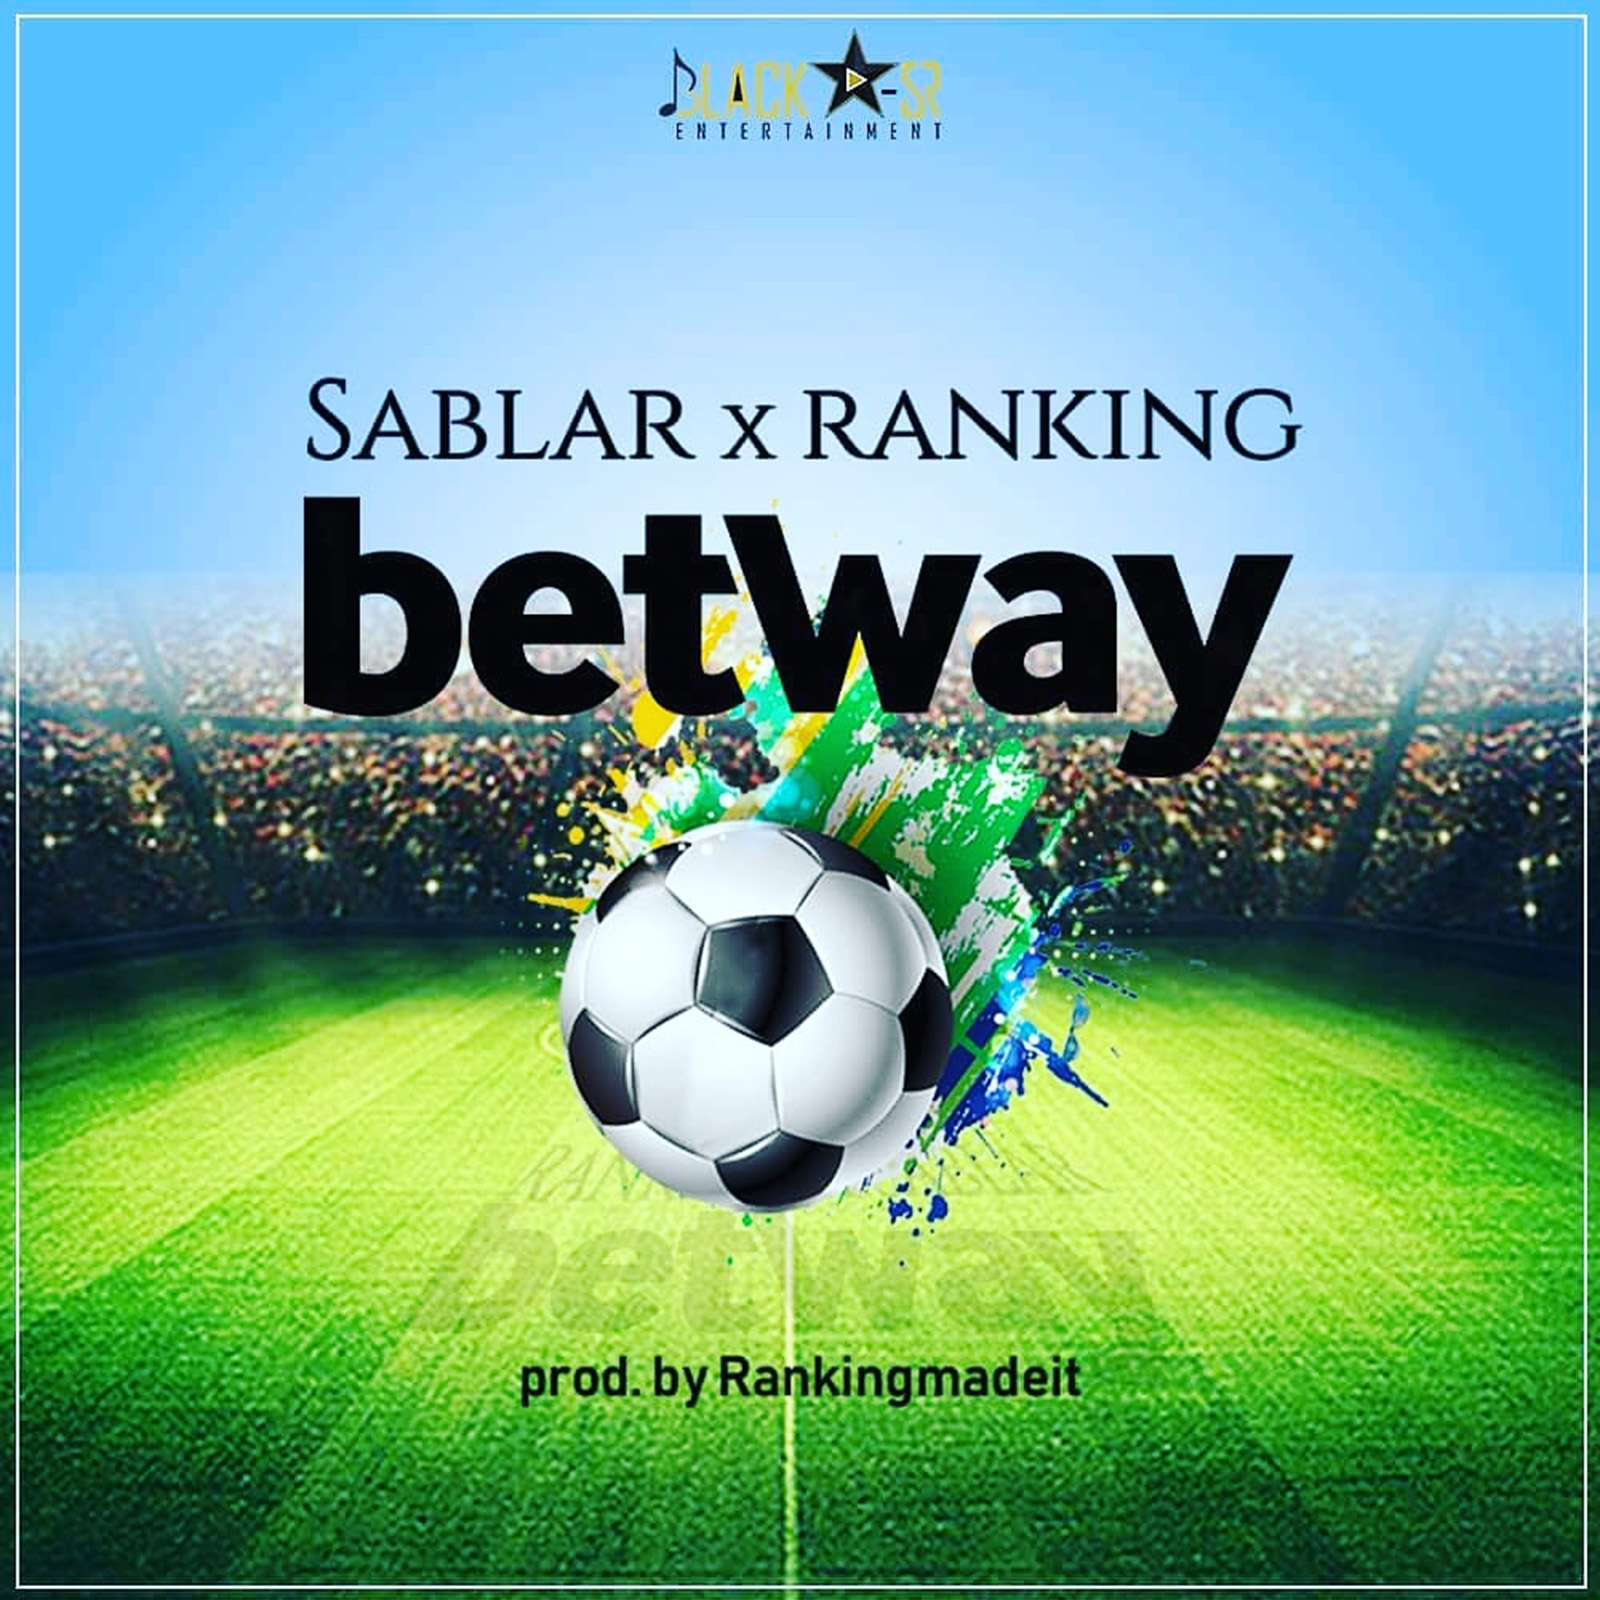 Betway by Sablar & Ranking